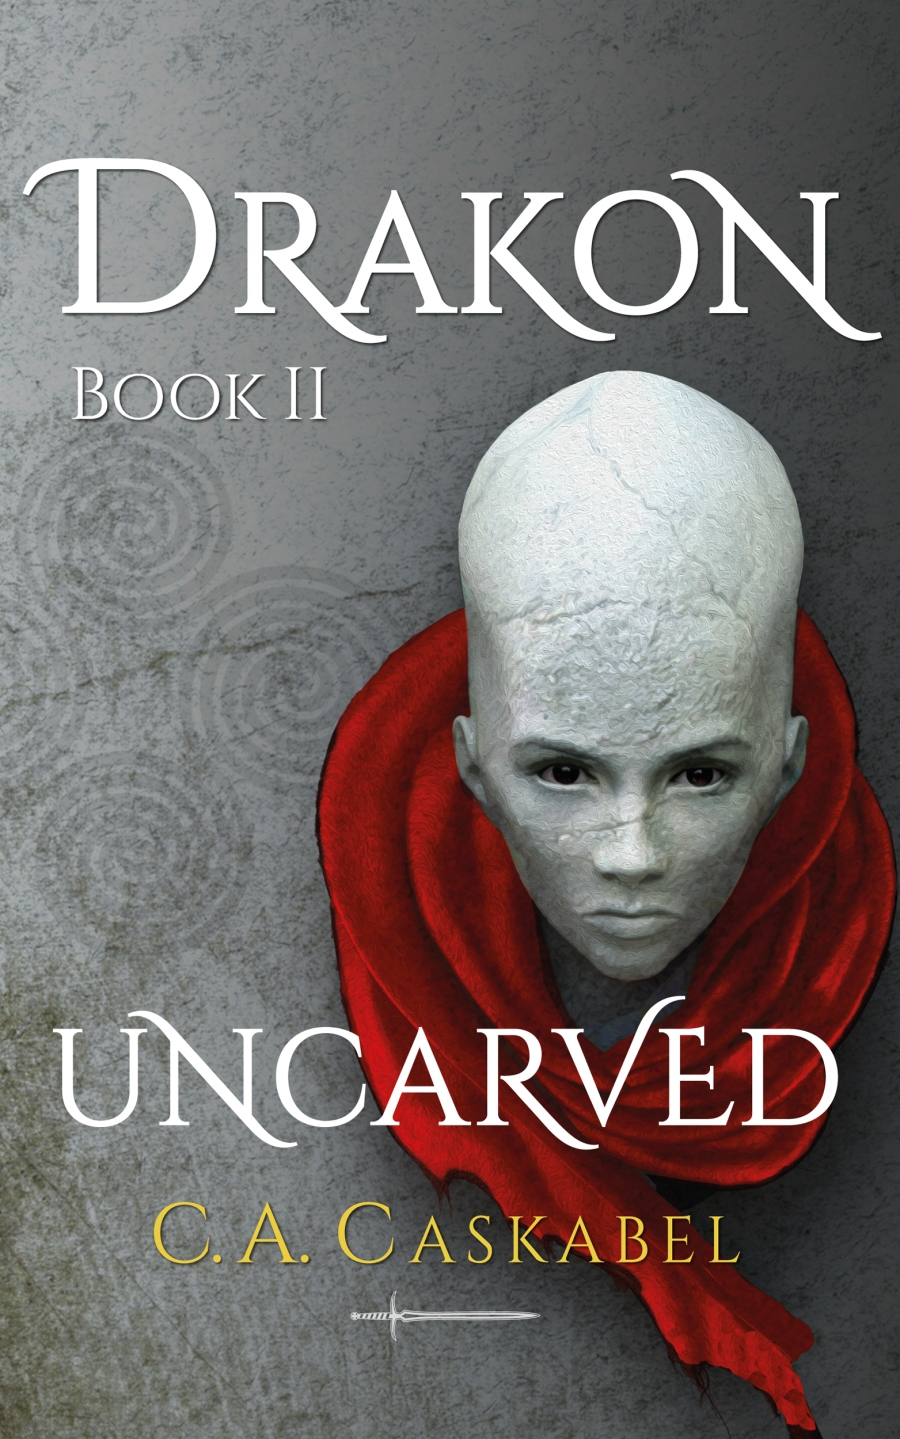 Drakon Book II Cover